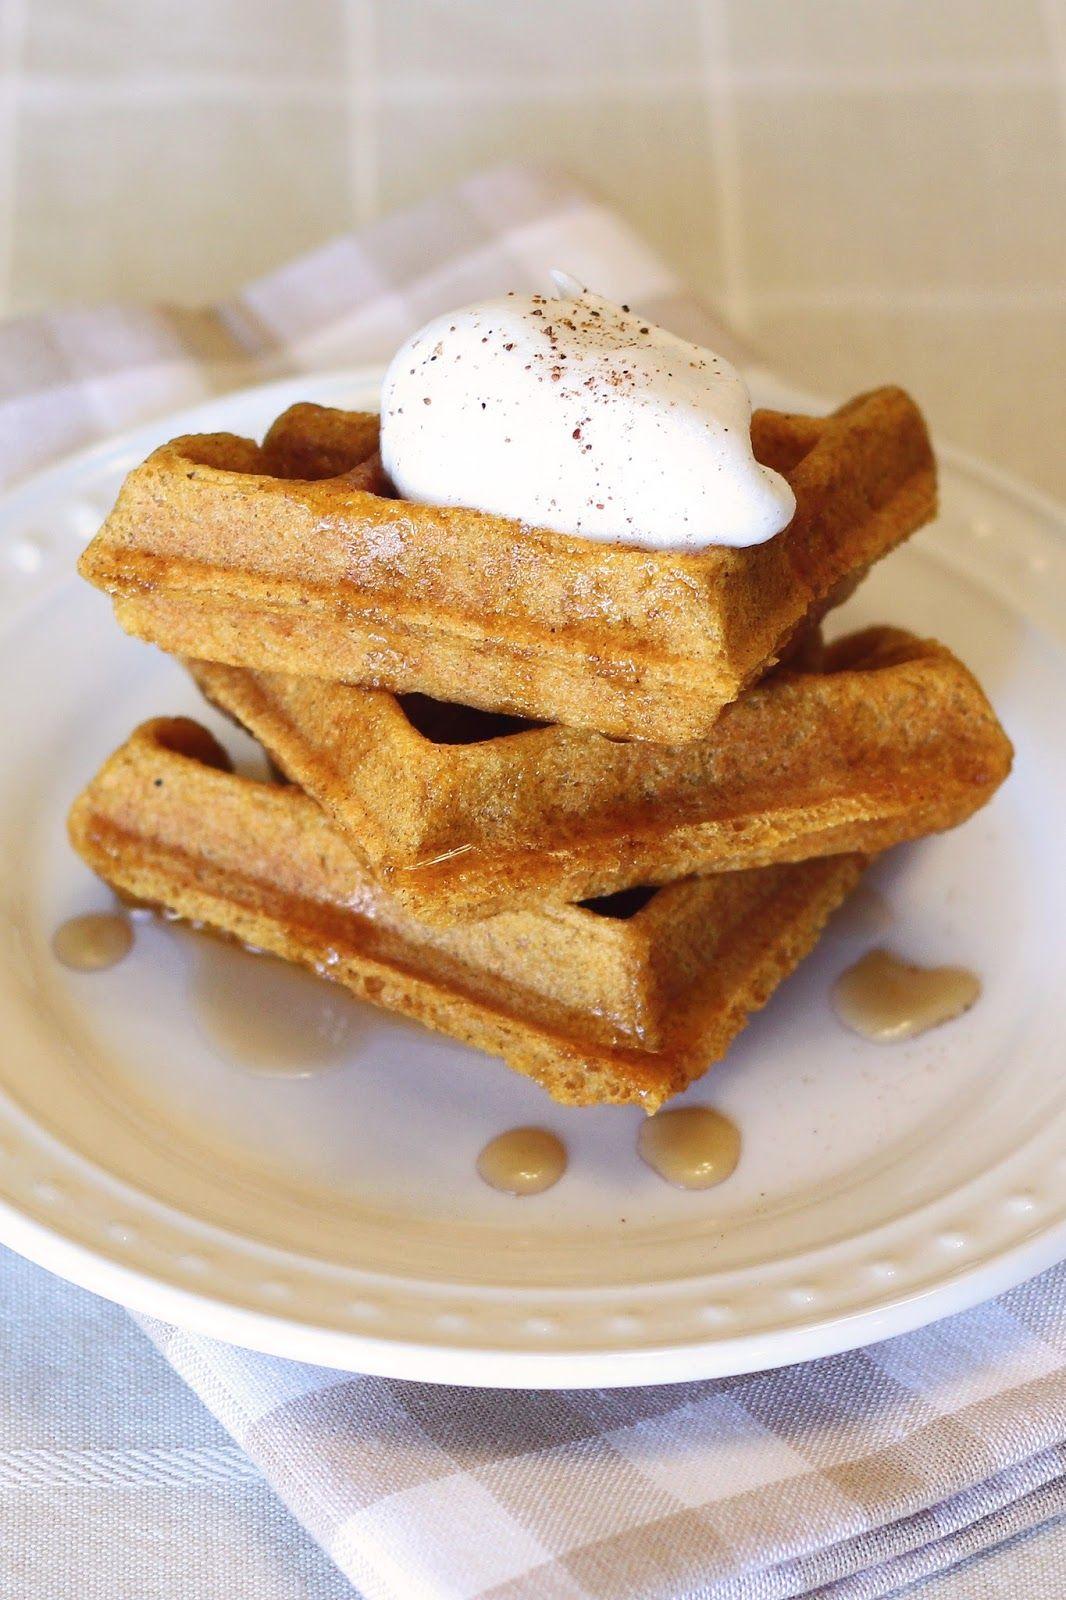 Gluten free vegan pumpkin waffles Recipe (With images